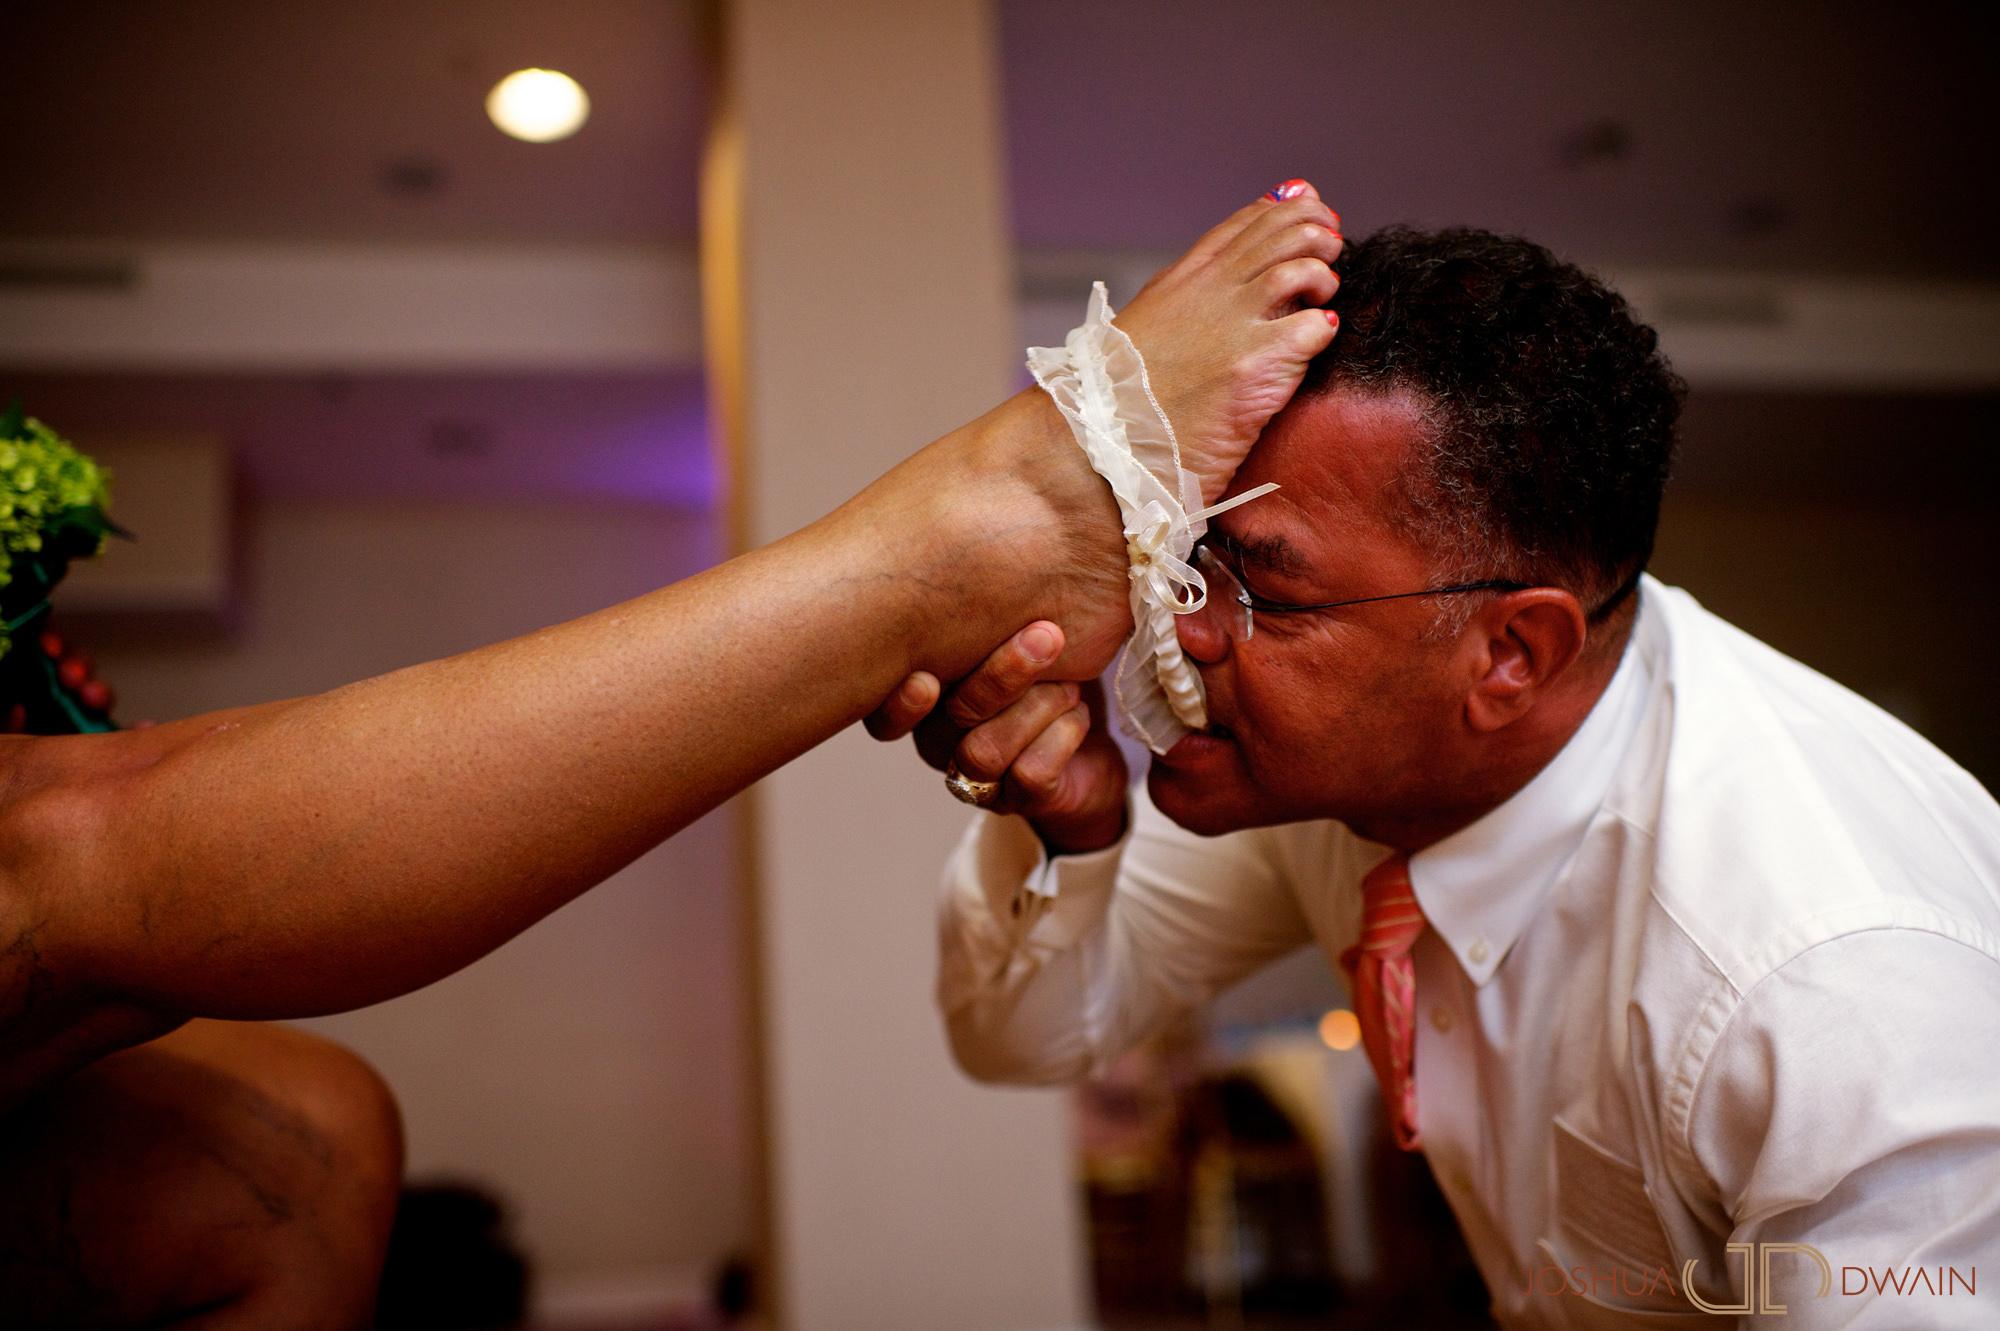 candra-alonza-016-holiday-inn-south-beach-miami-wedding-photographer-joshua-dwain-2012-07-28_ca_434